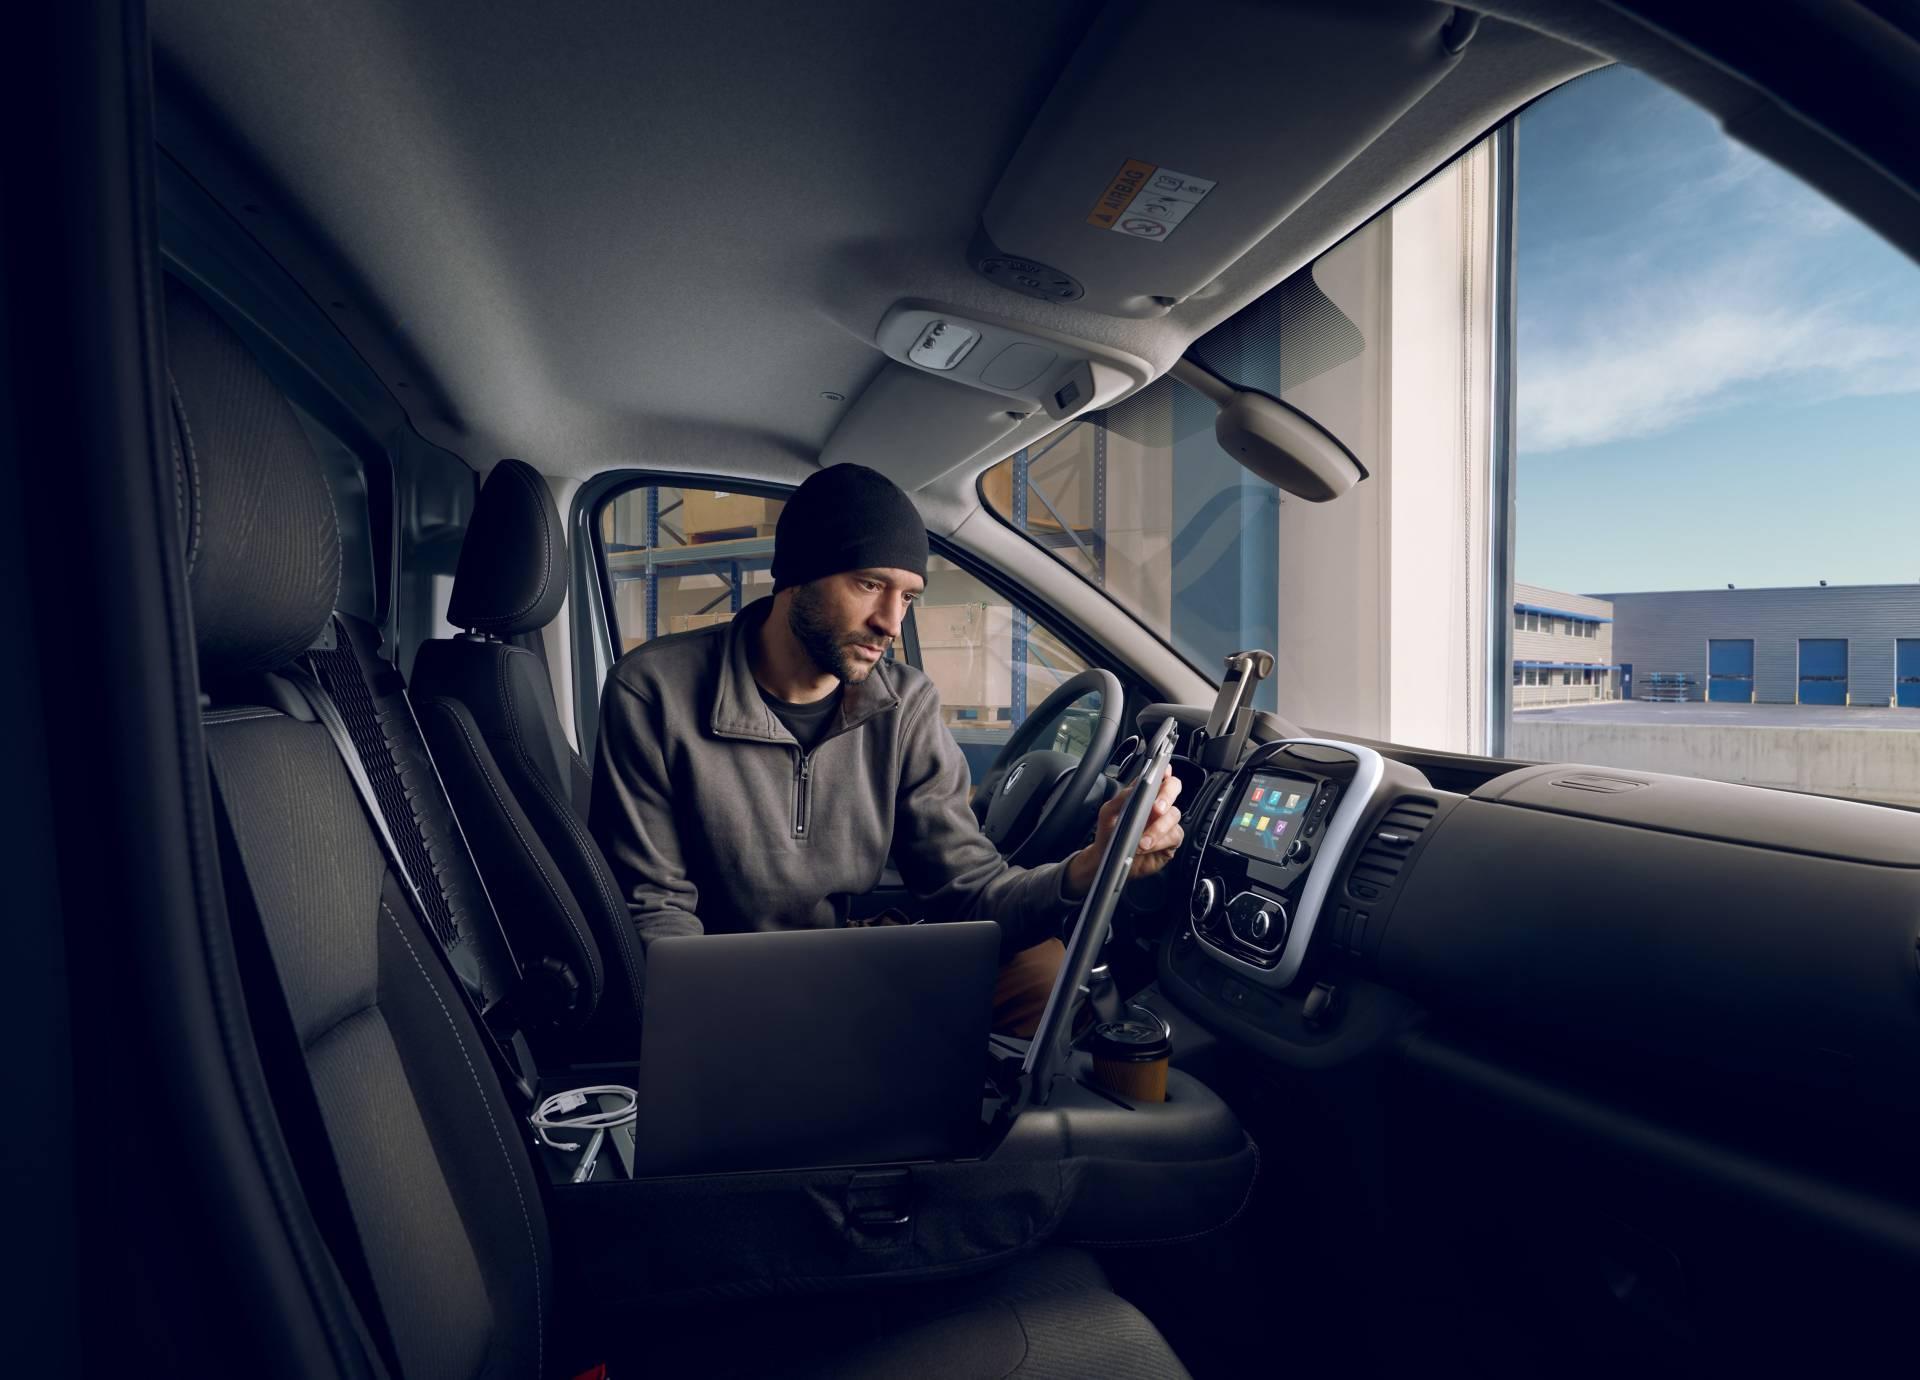 eb352cfd-2019my-renault-trafic-van-facelift-13